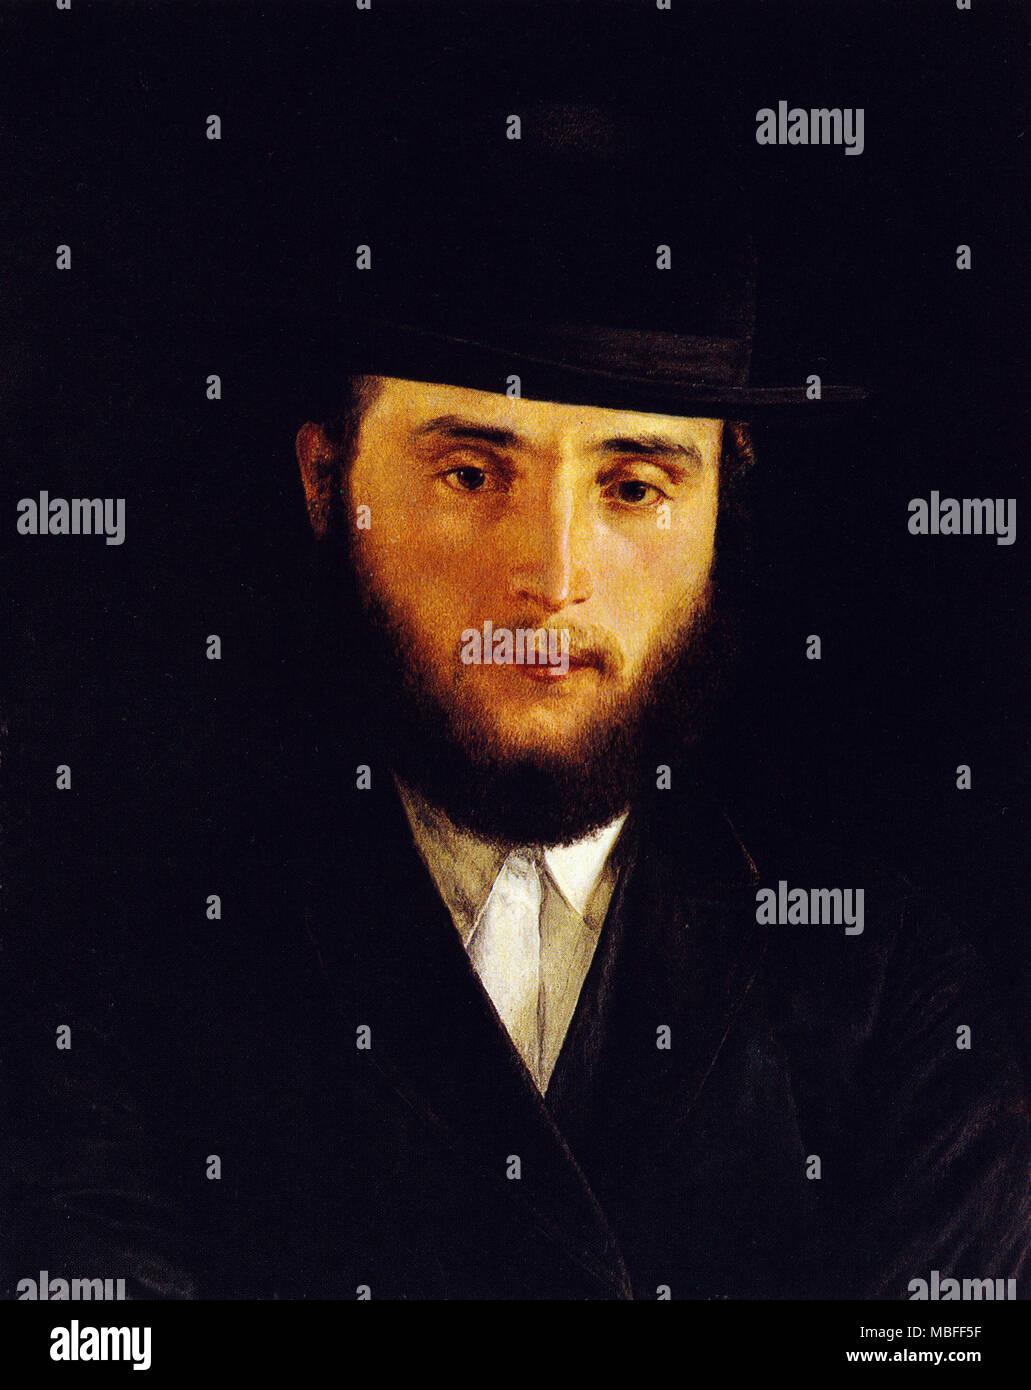 Talmudic scholar - Stock Image